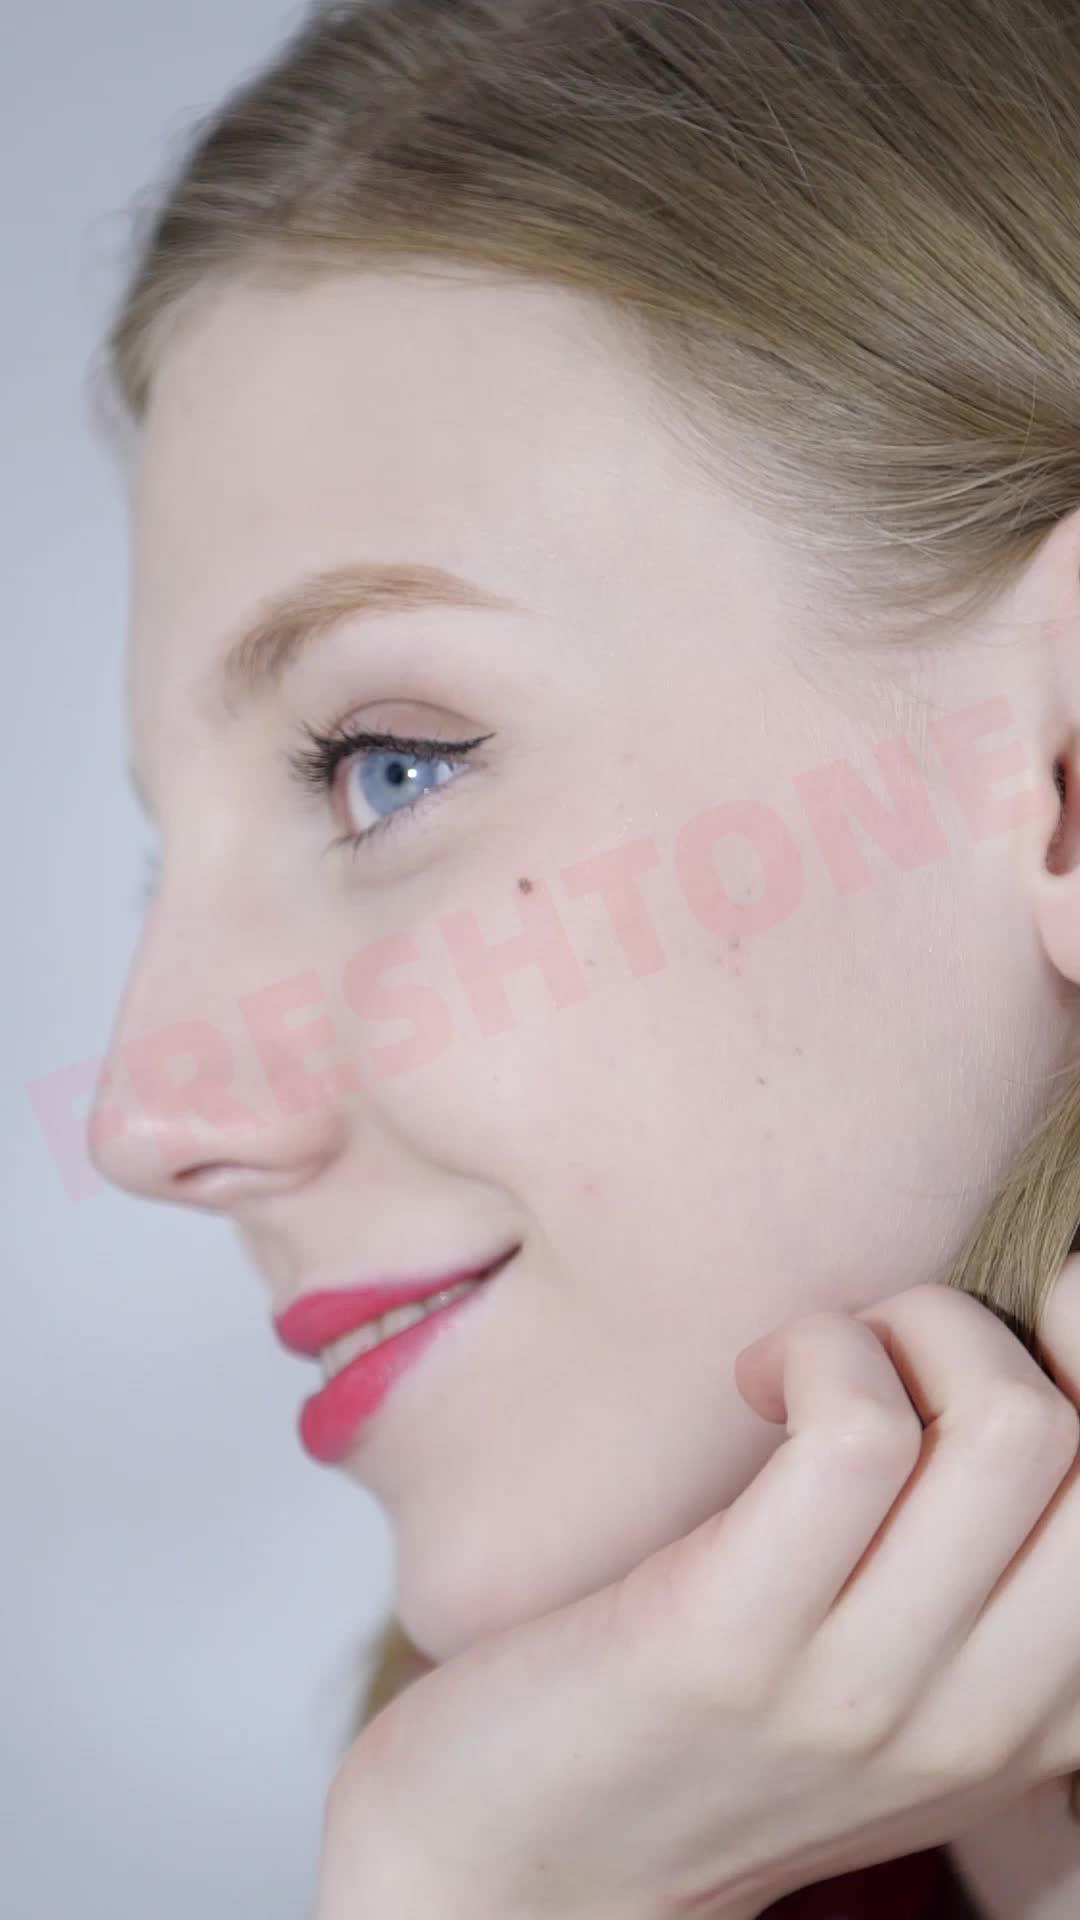 Freshtone Catchy eye to eye decorative wholesale contact lens at low prices